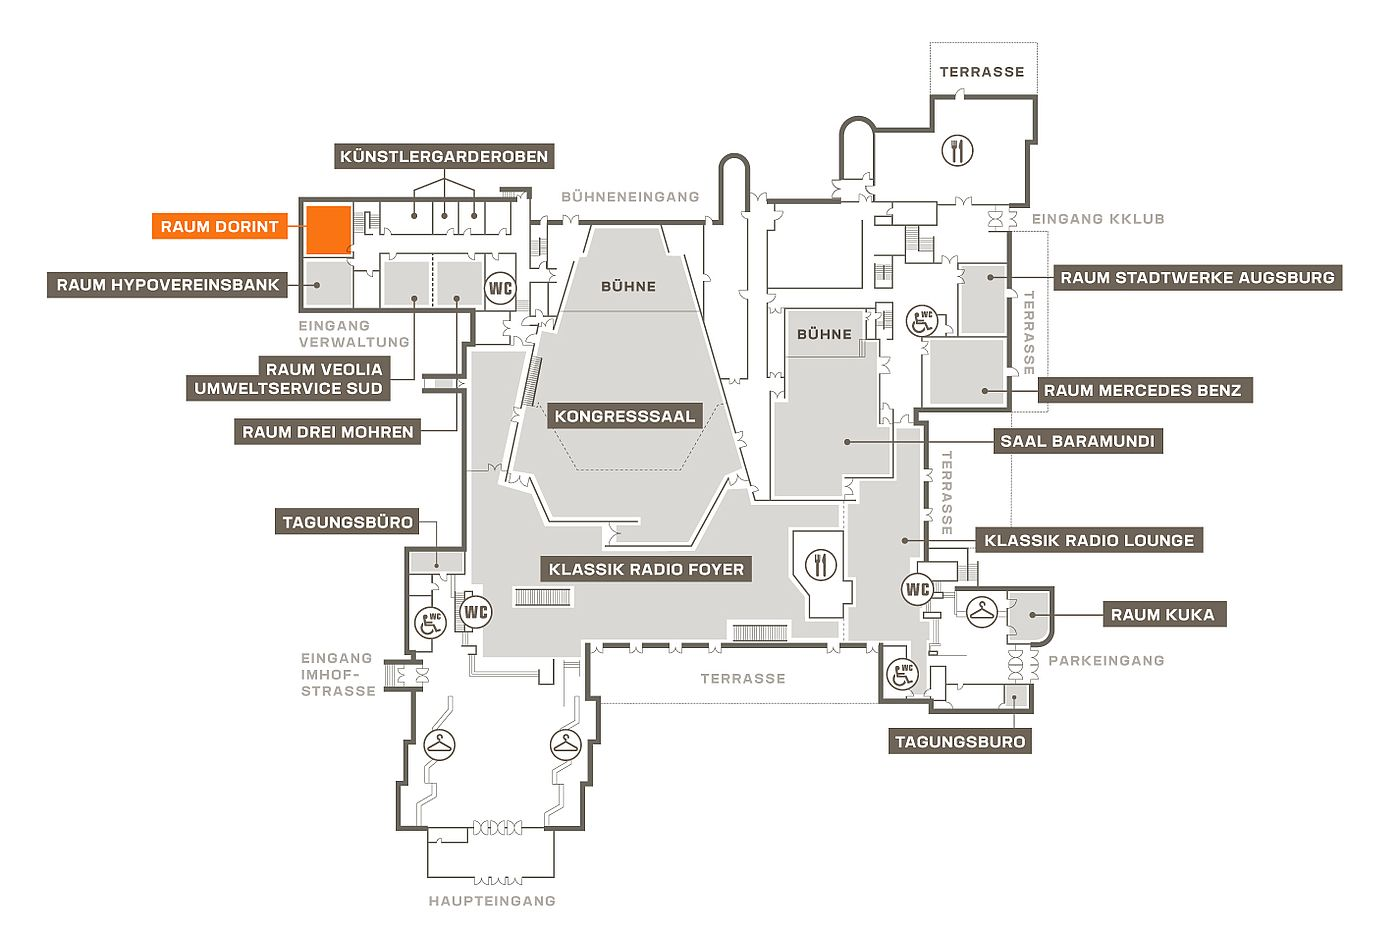 veranstalten kongress am park. Black Bedroom Furniture Sets. Home Design Ideas